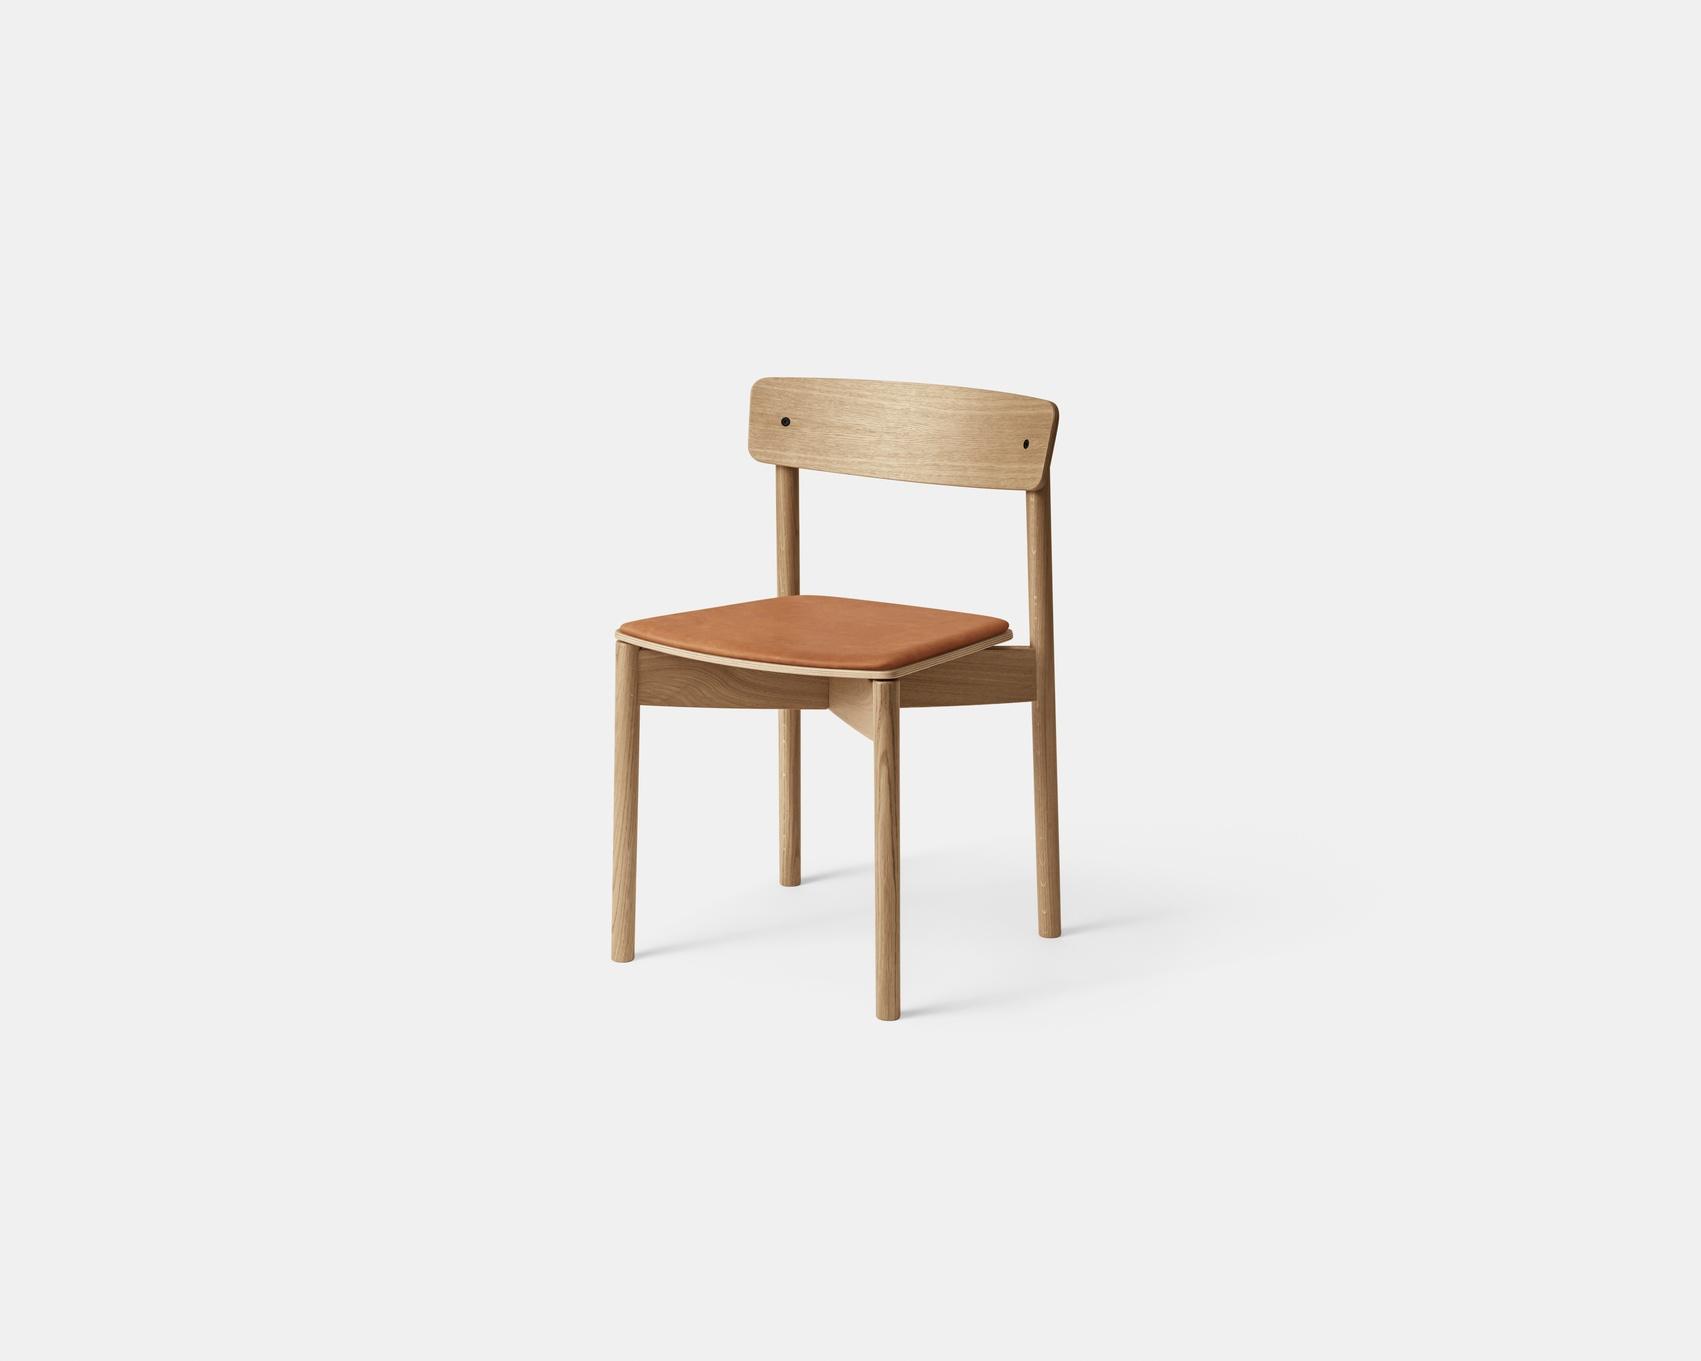 t01-cross-chair_48952627786_o